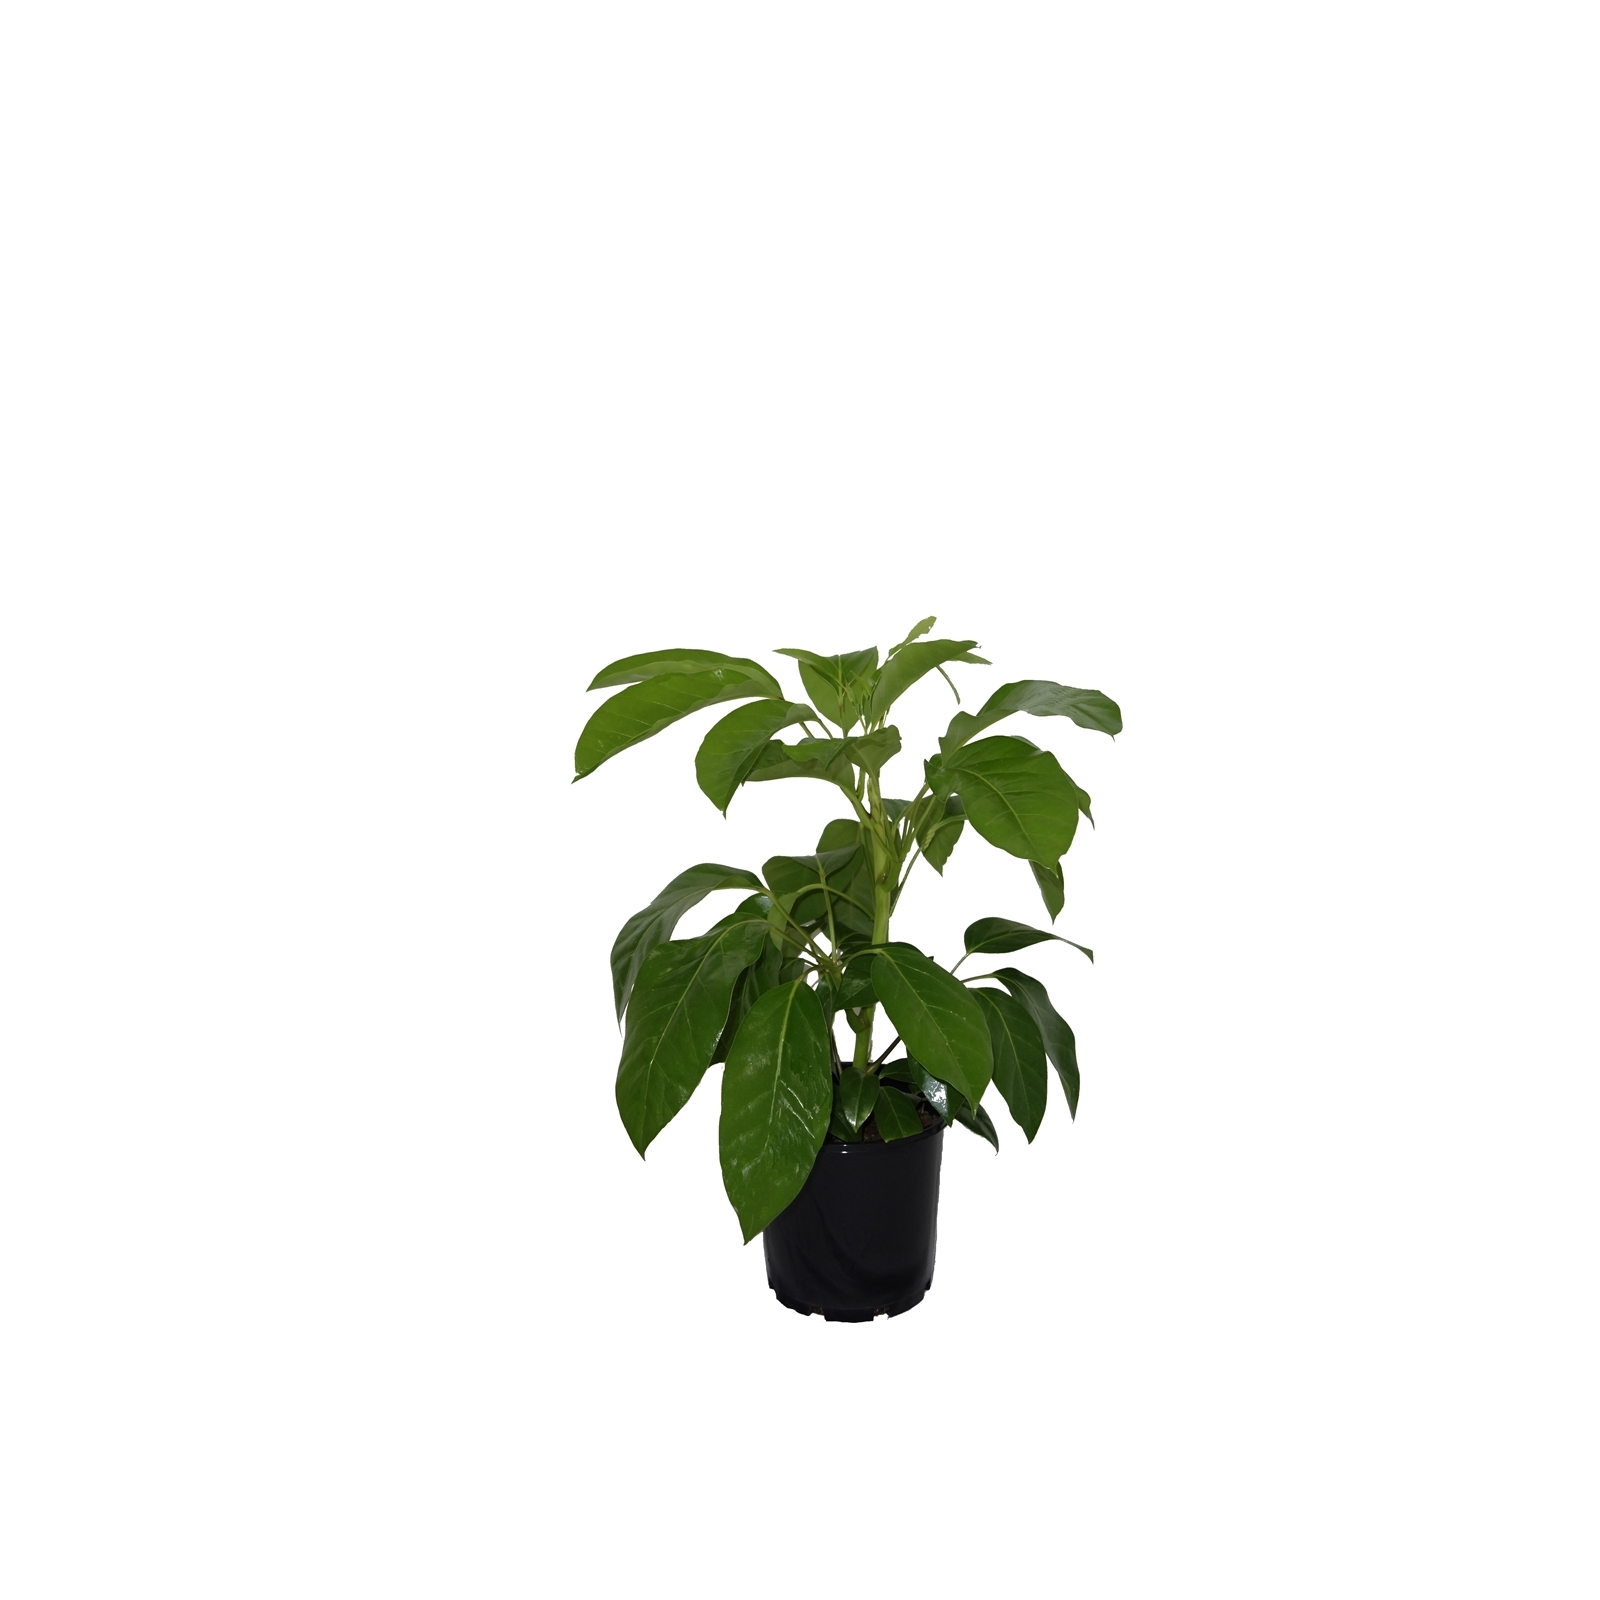 200mm Umbrella Tree - Shefflera amate